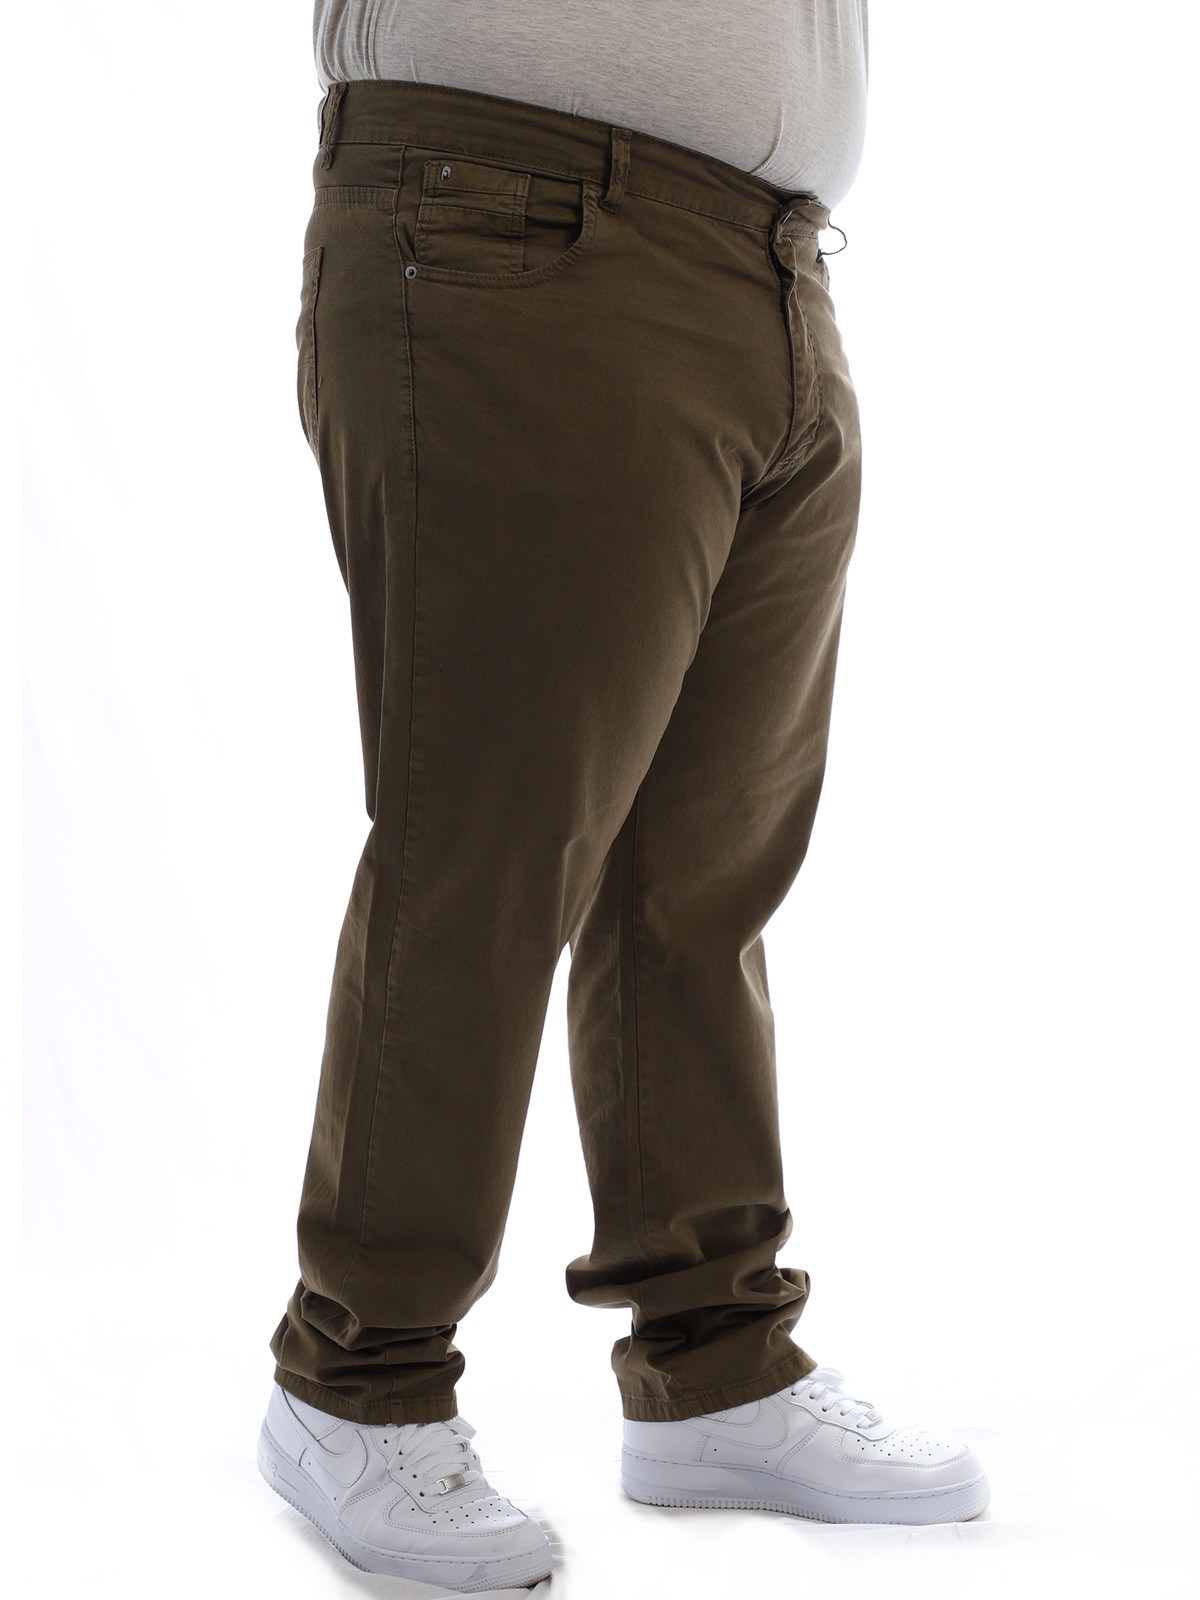 Calça Plus Size Masculina Sarja Tinturada Com Strech Verde